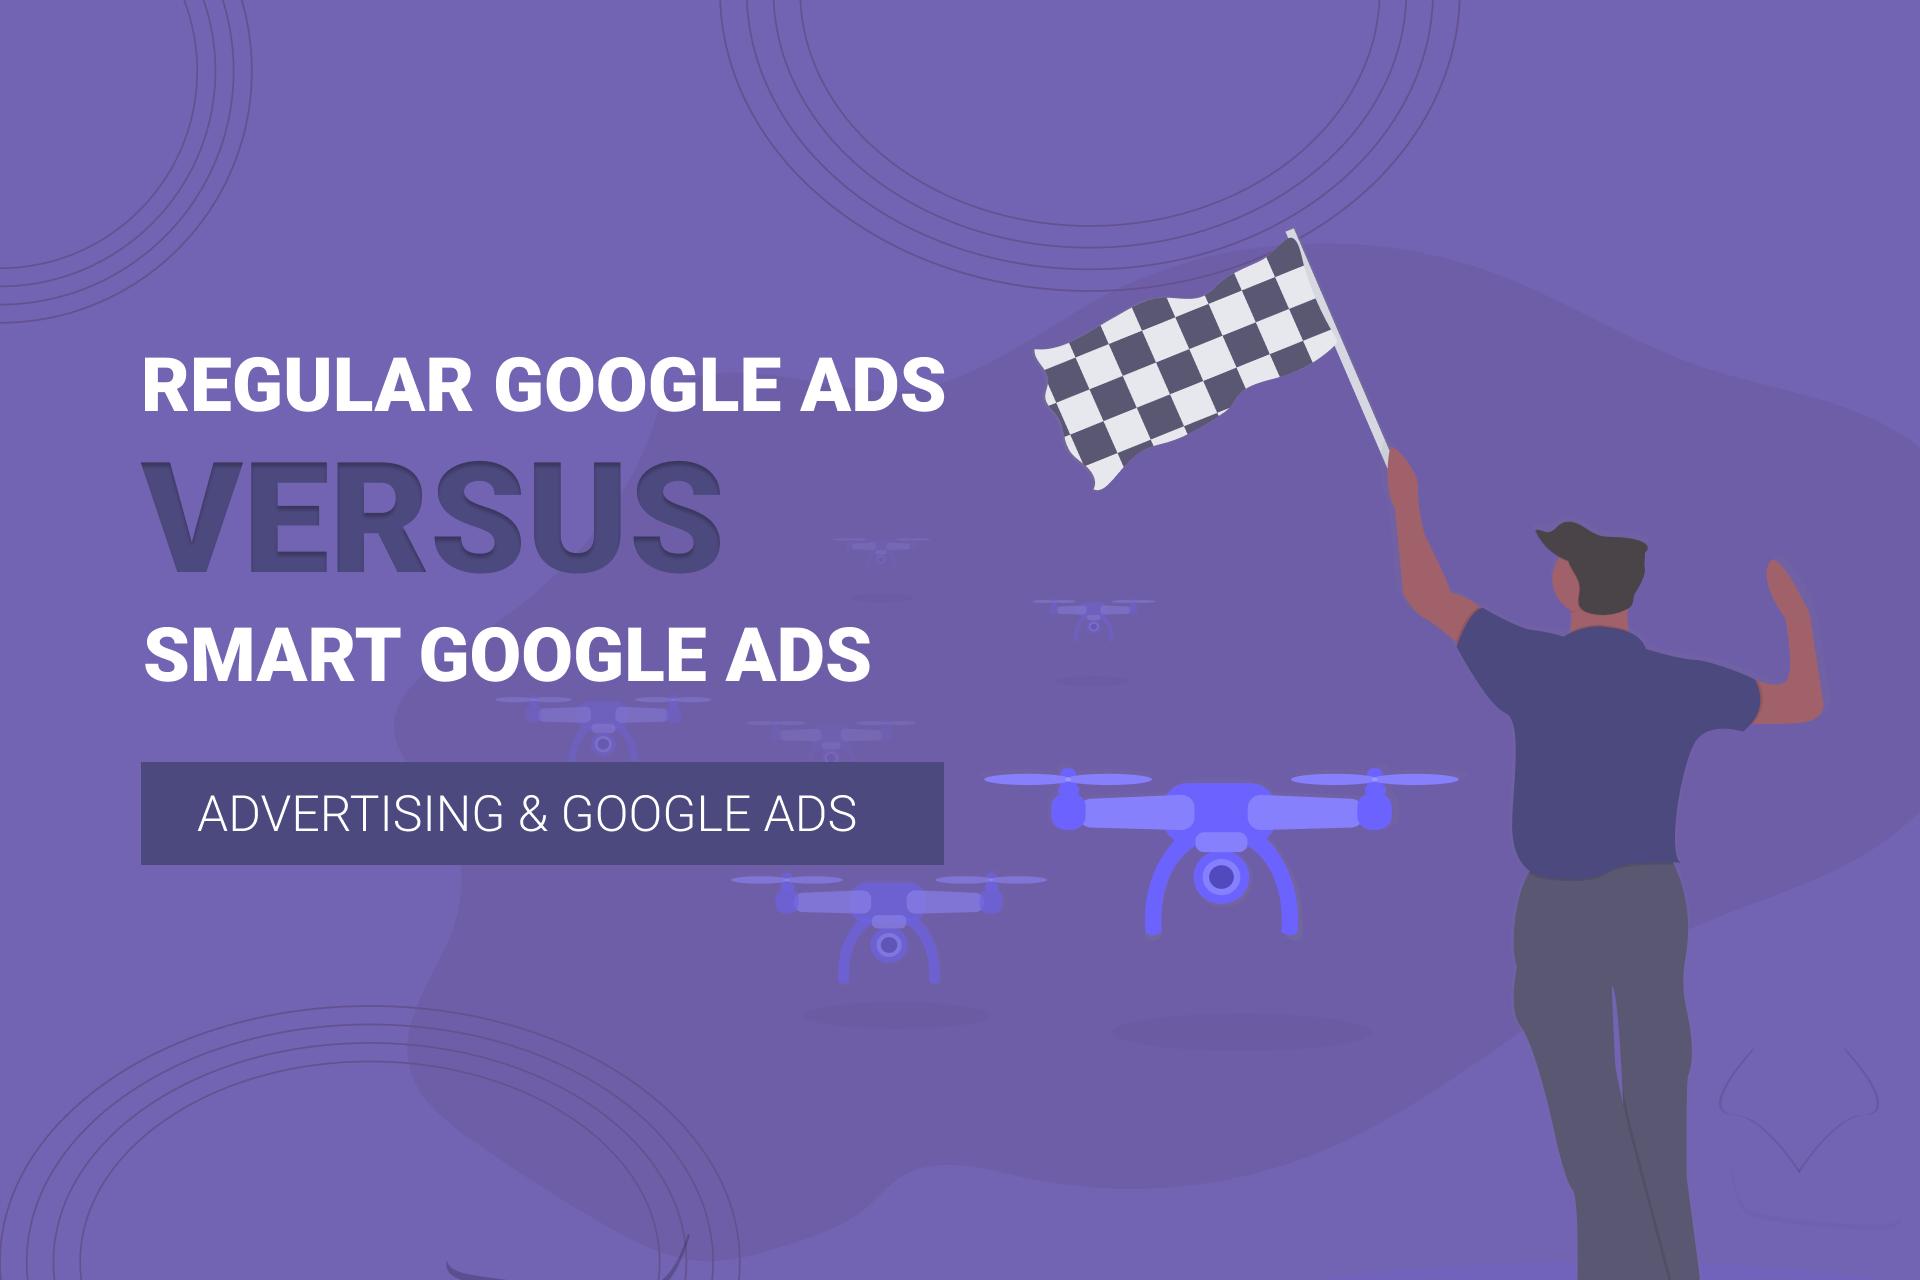 Google Smart Campaigns Vs Regular Google Ads Campaigns